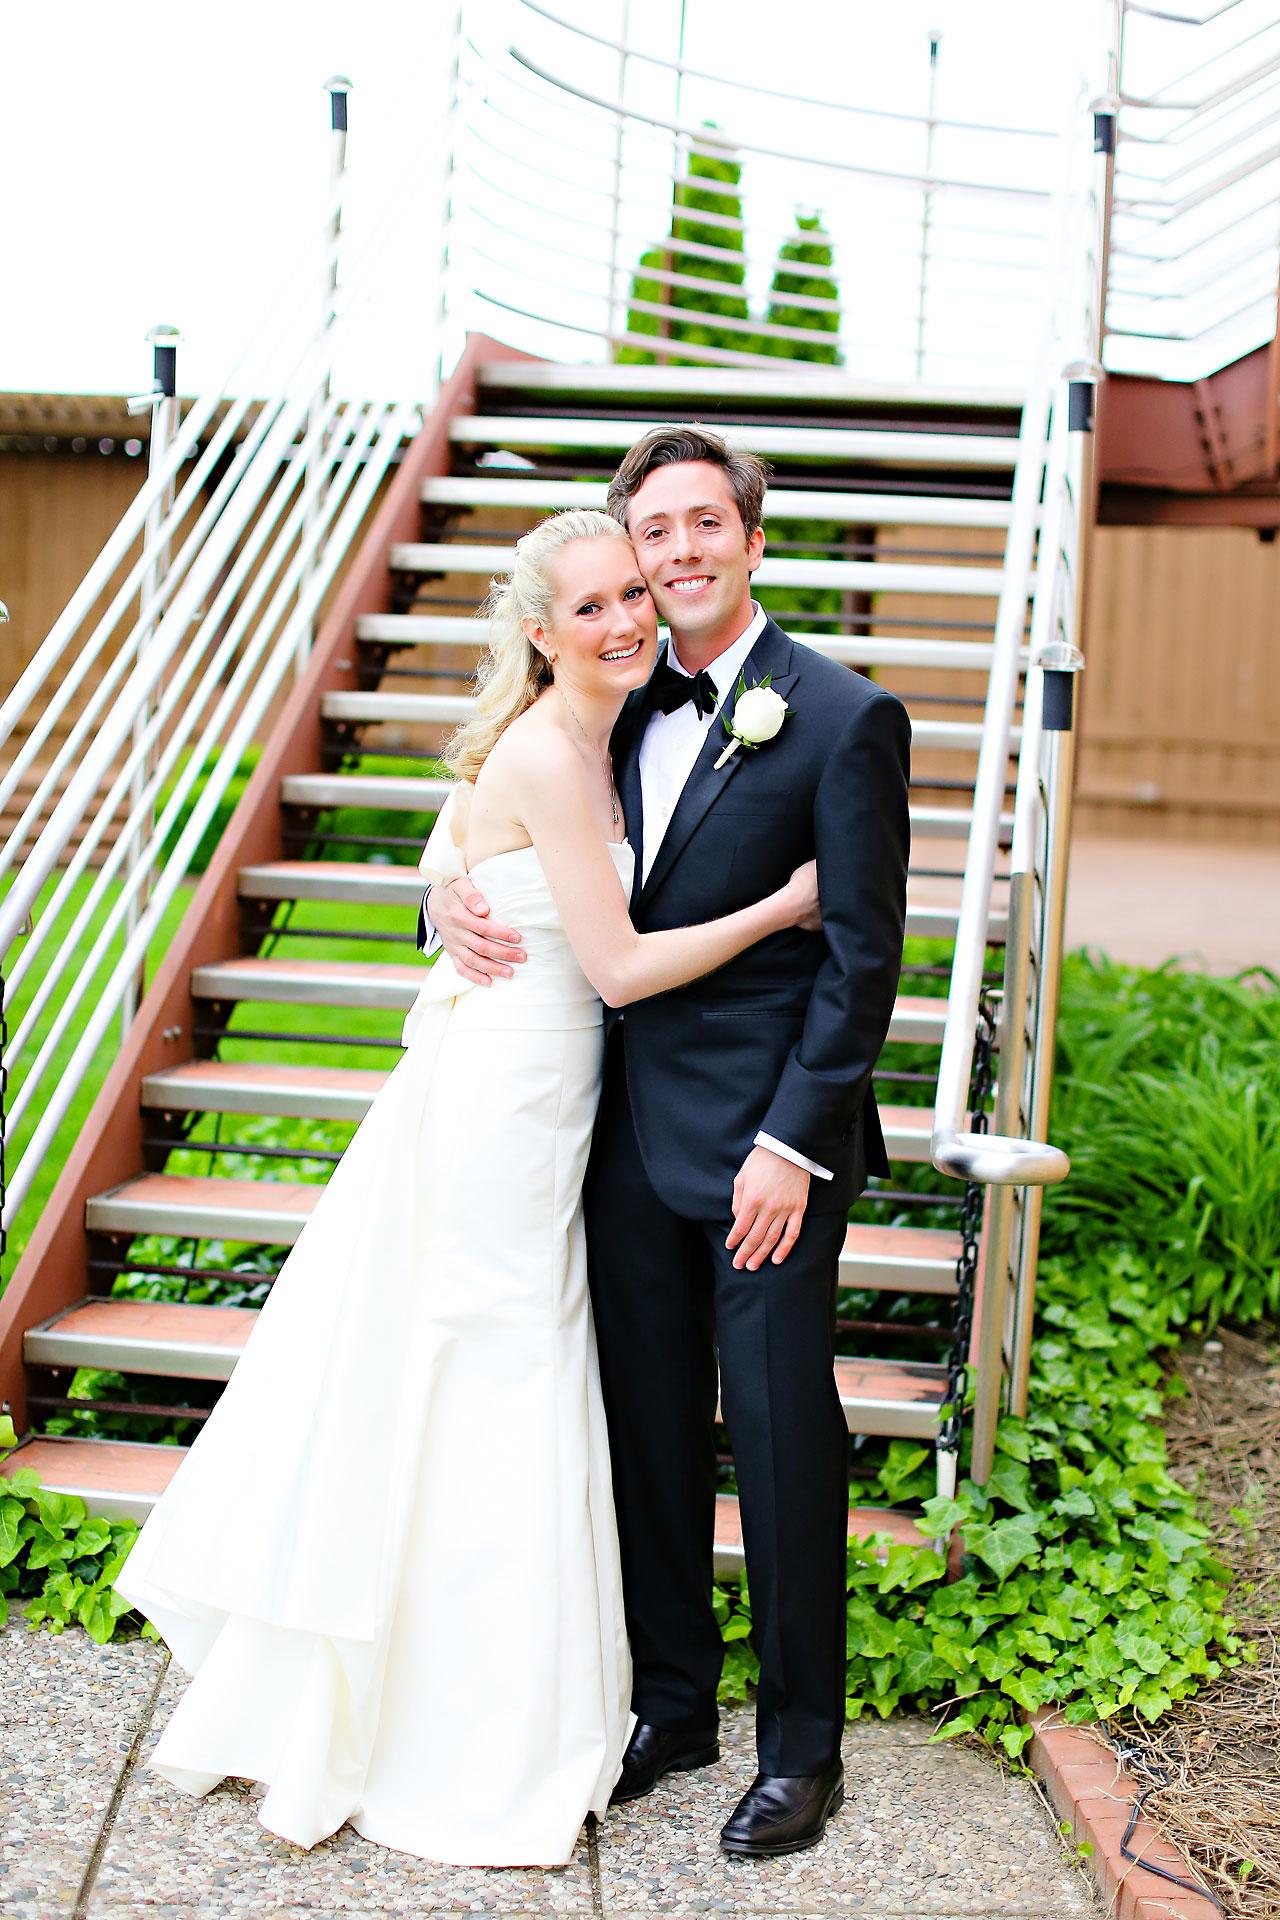 149 Janice Frank Mavris Wedding Indianapolis